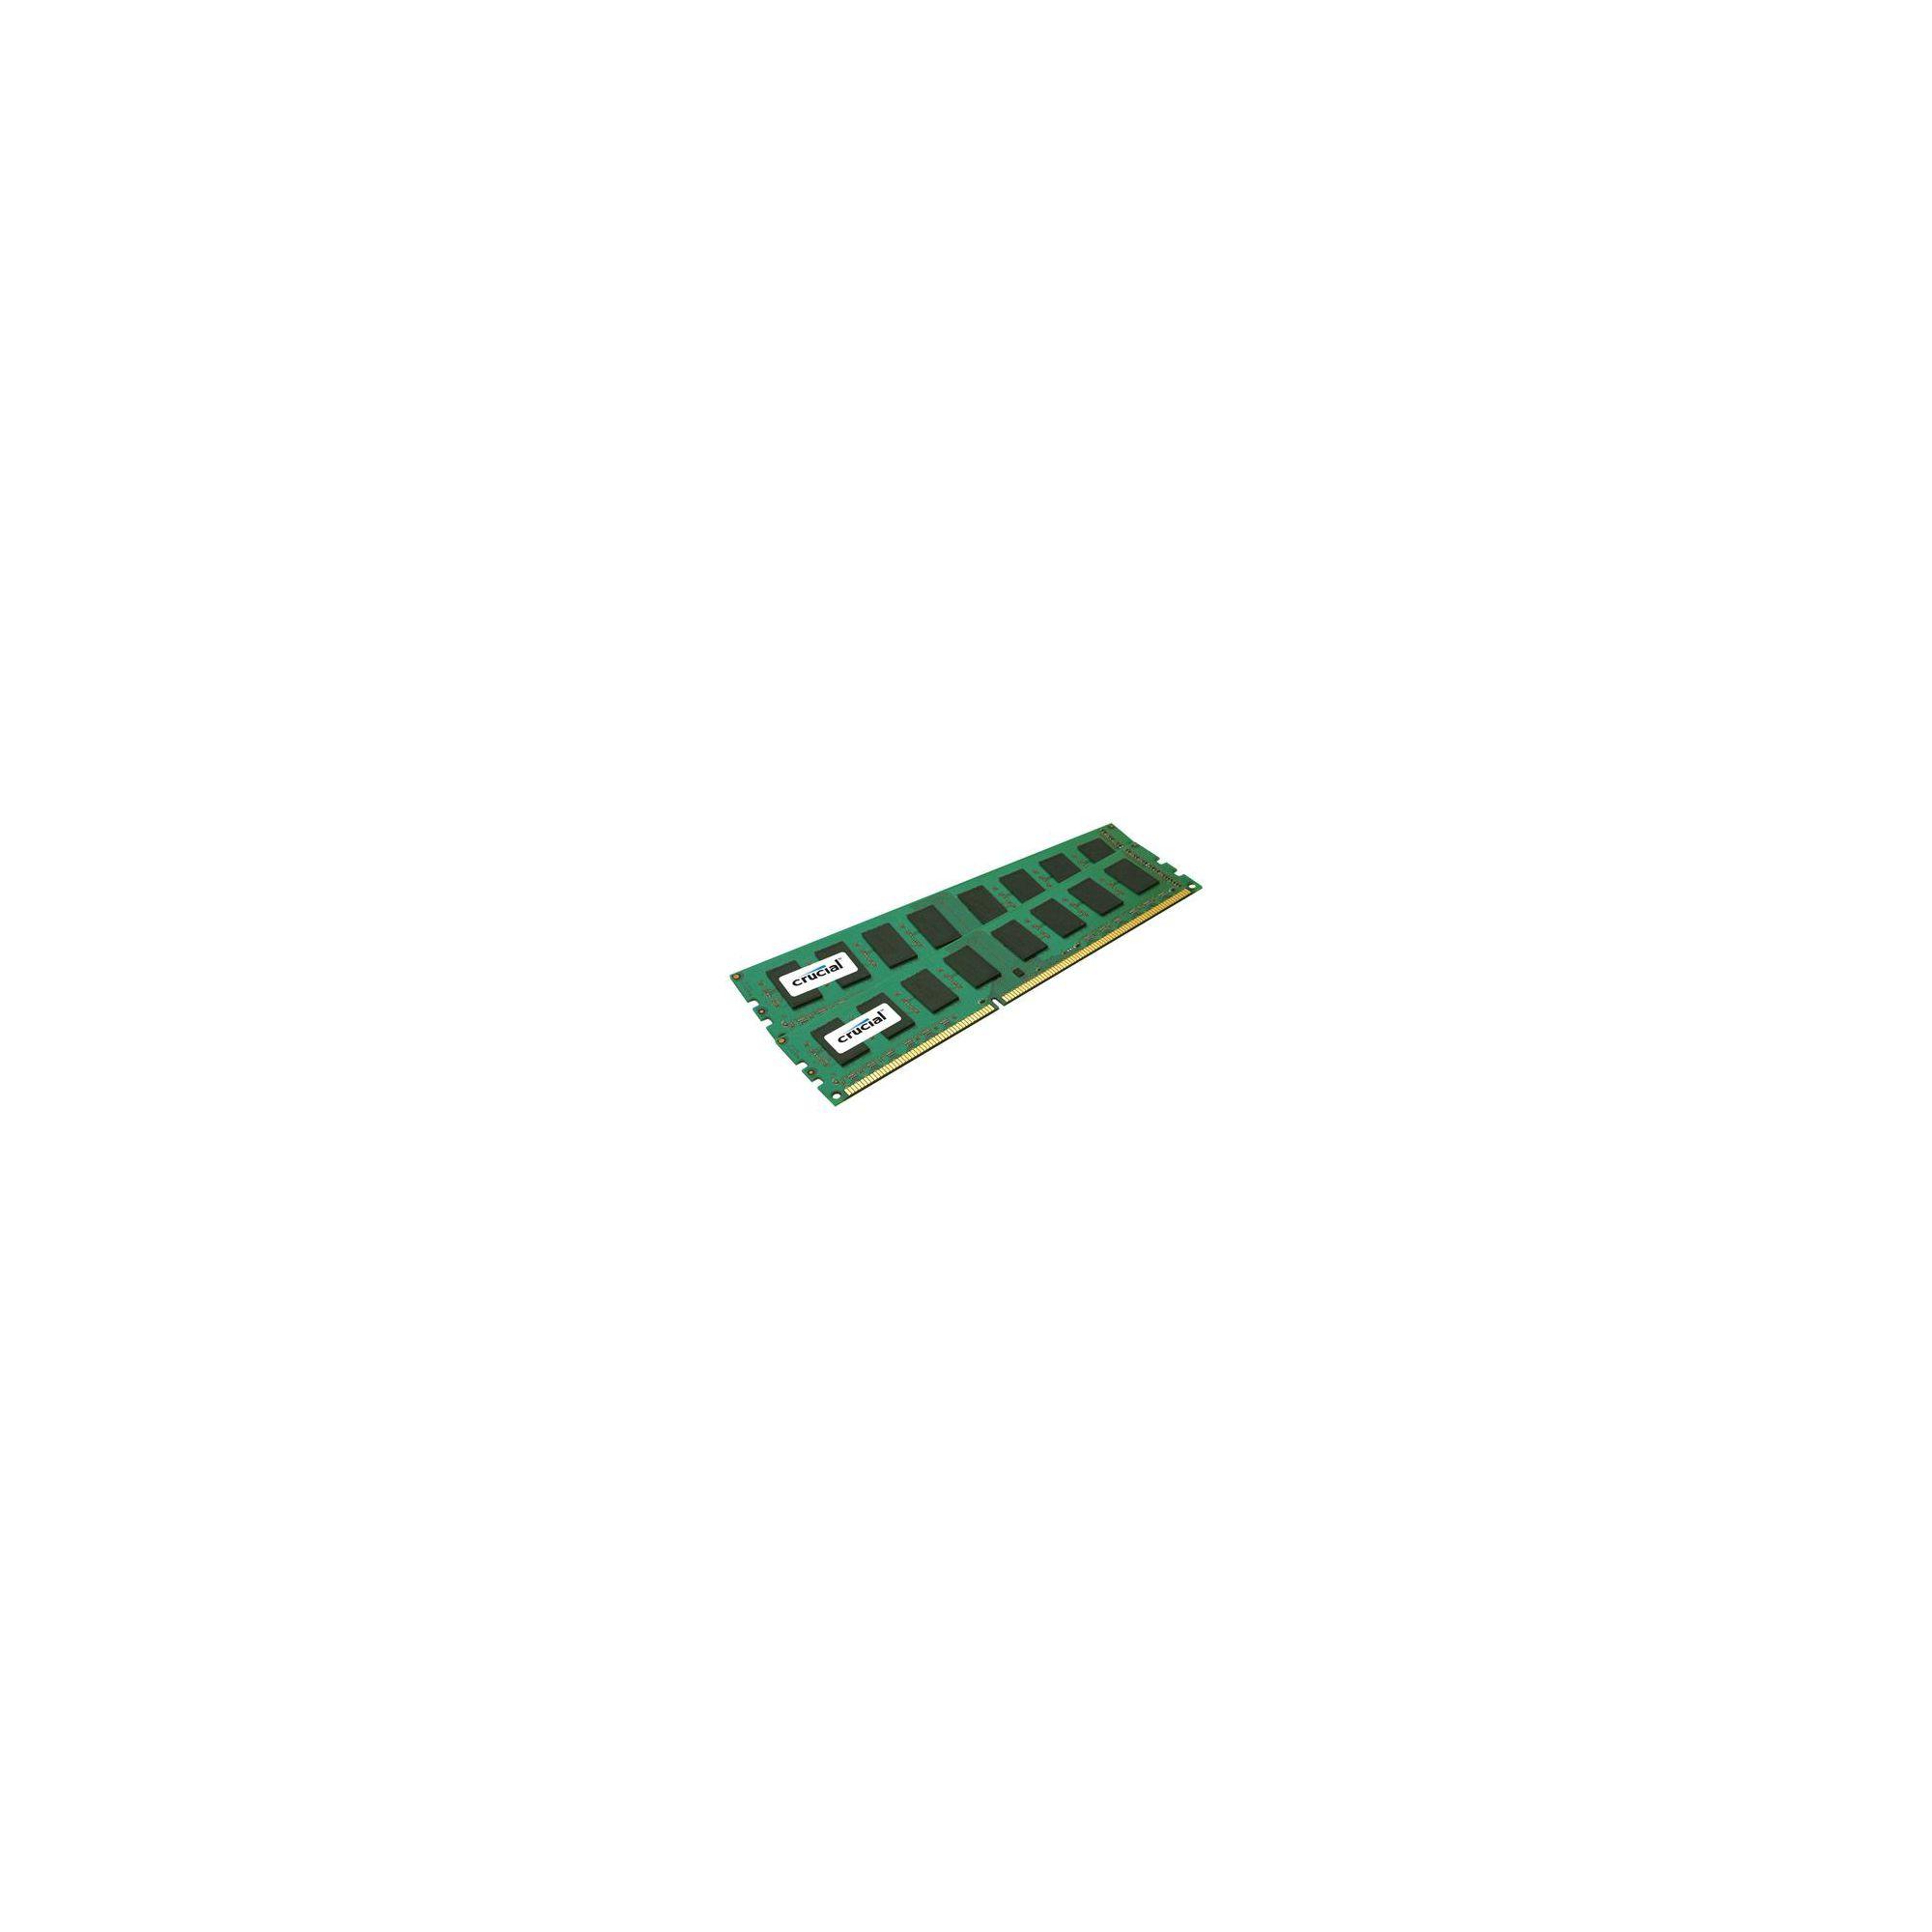 Crucial 4GB Memory Kit (2x2GB) PC3-10600 1333MHz DDR3 Unbuffered Non